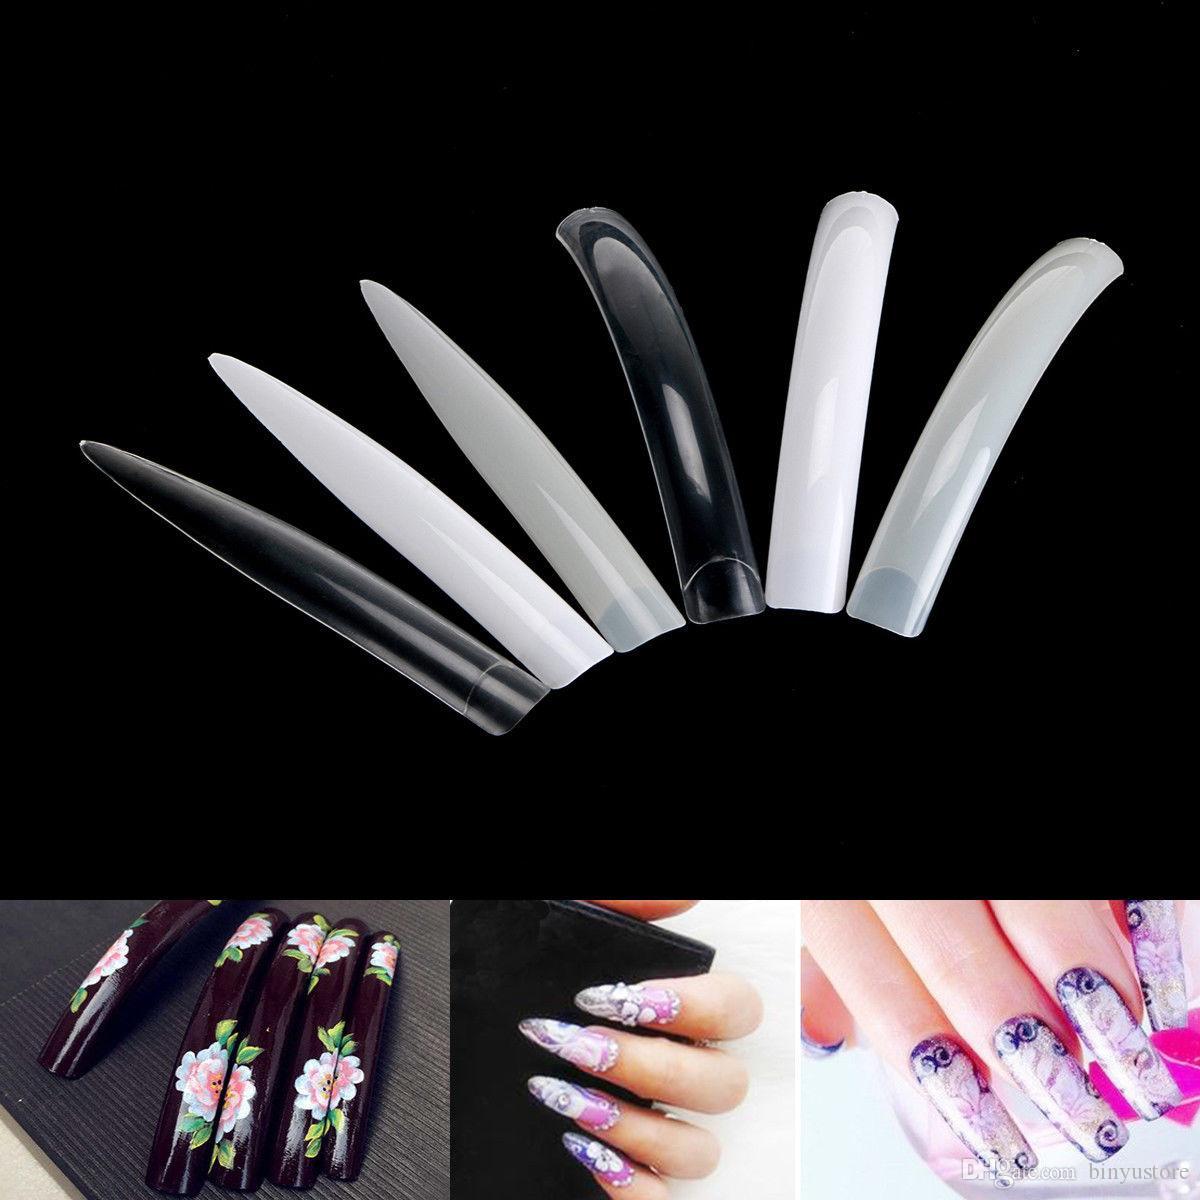 Hot Sale New 100PCS Super Extra Long False Nail Art Tips Acrylic Gel Salon Stage Art Tips 10 SIZE